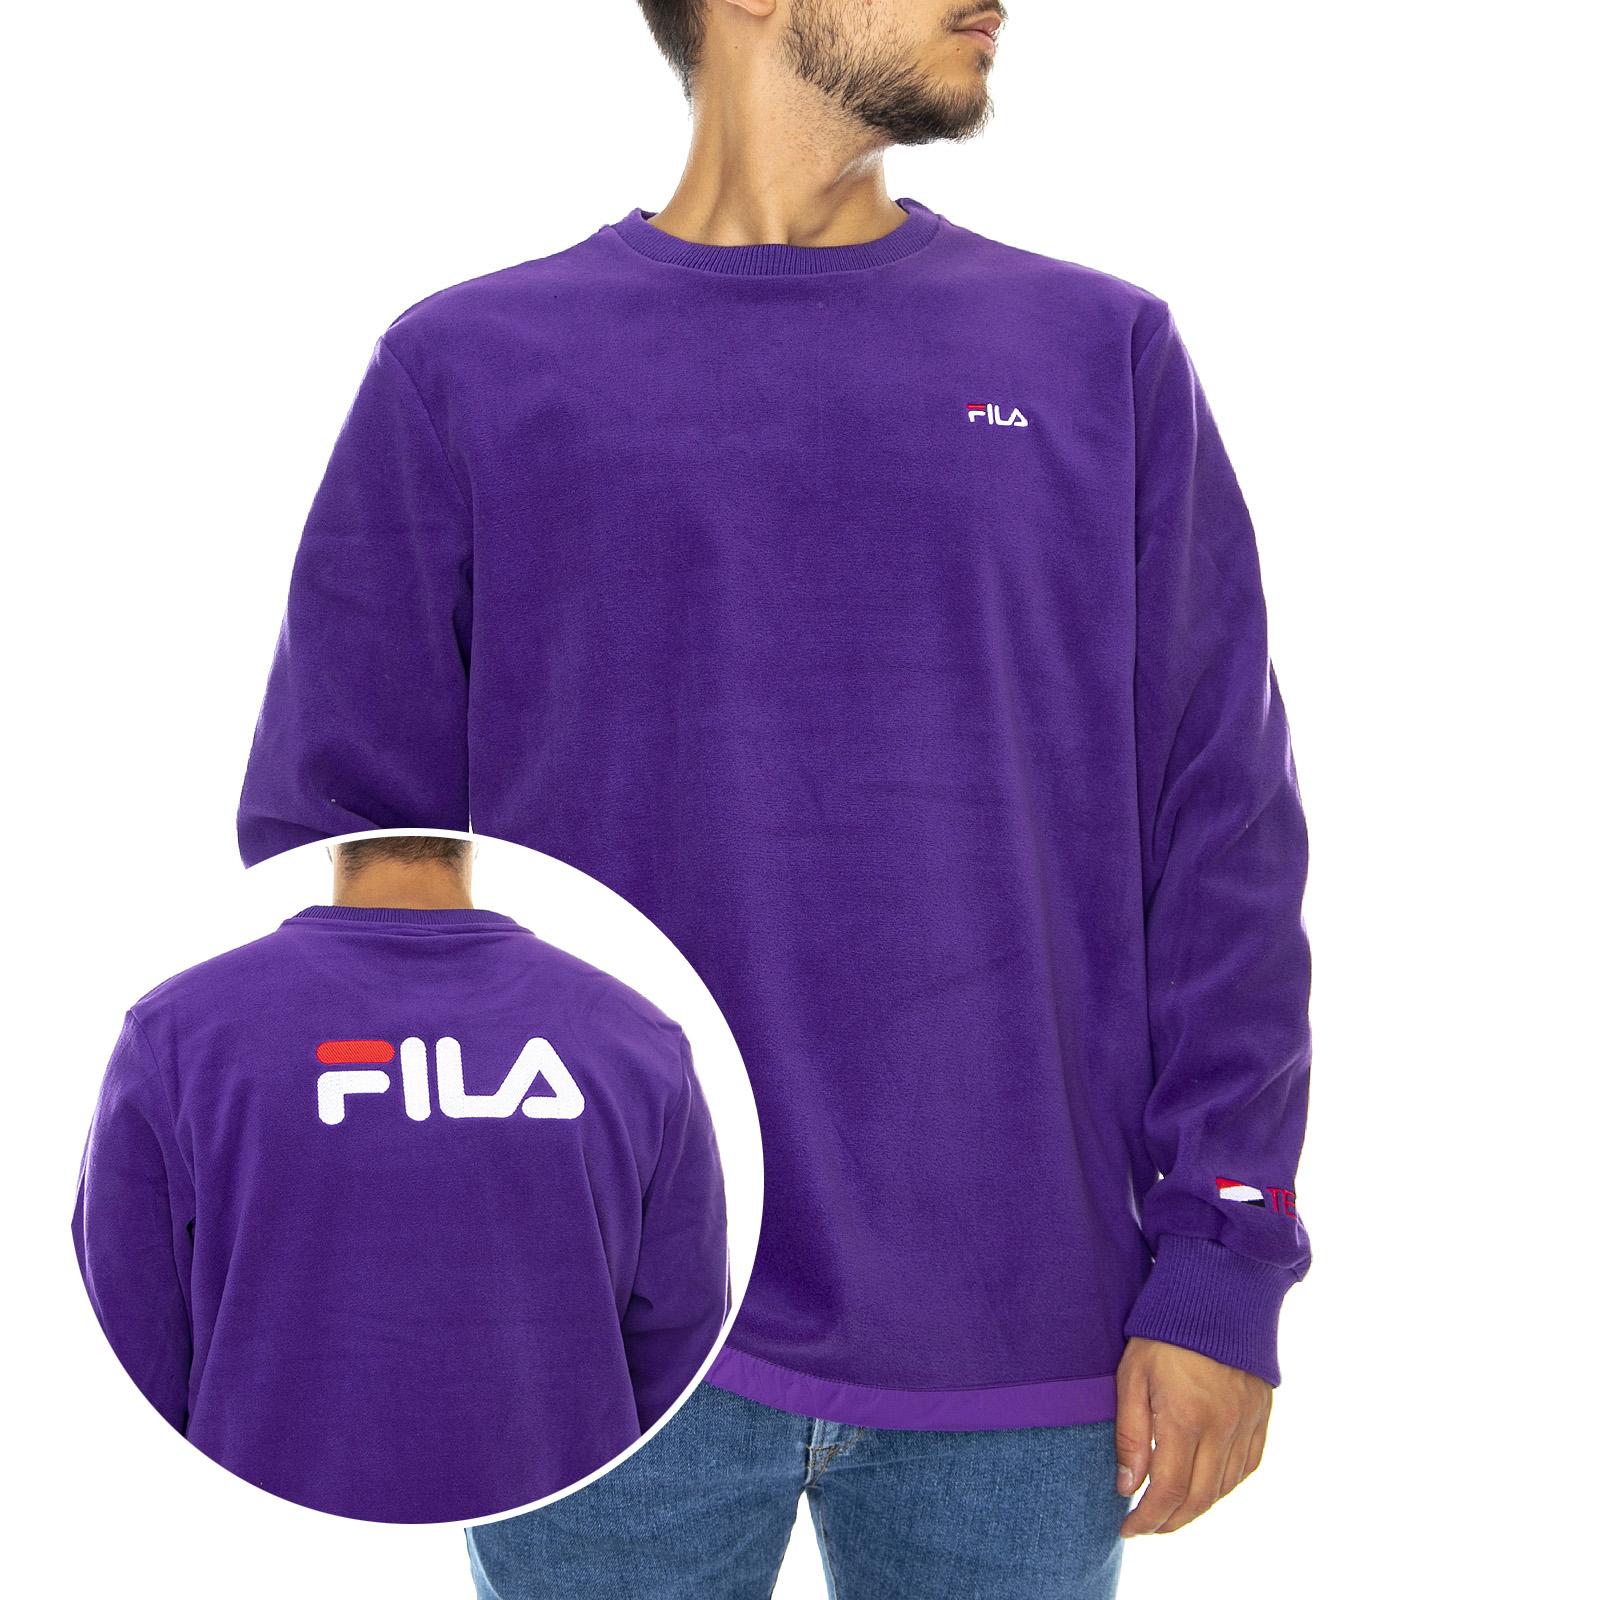 Fila Felpa Palestra Girocollo Logo Viola Uomo Acquista